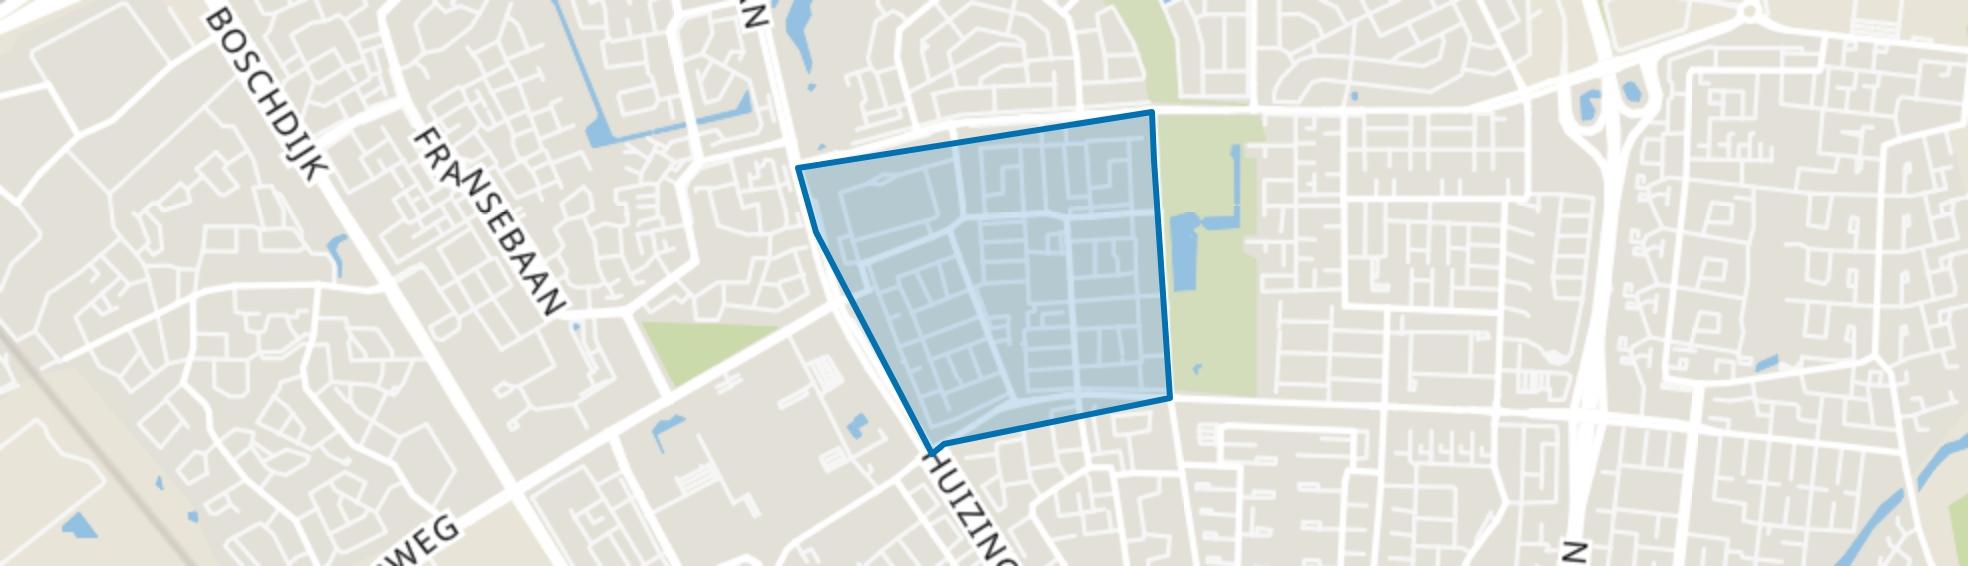 Woenselse Heide, Eindhoven map